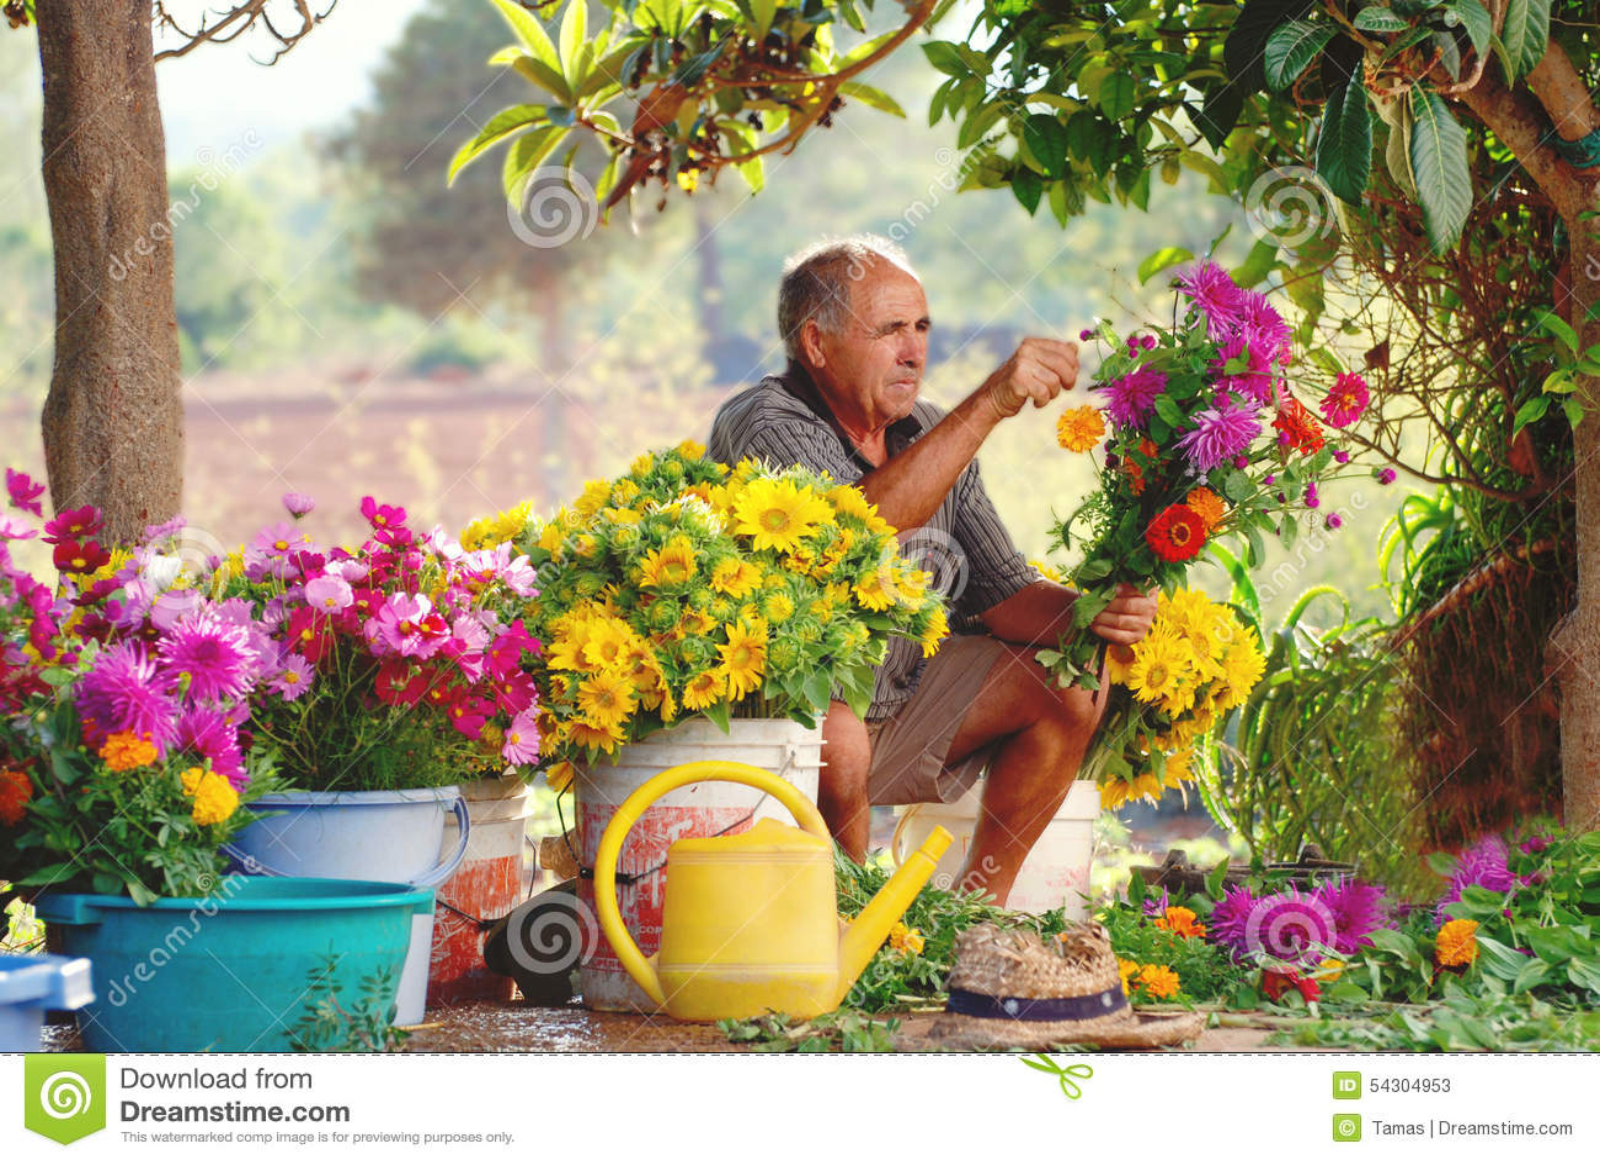 Old Spanish Farmer Making Country Flower Arrangements Stock Image